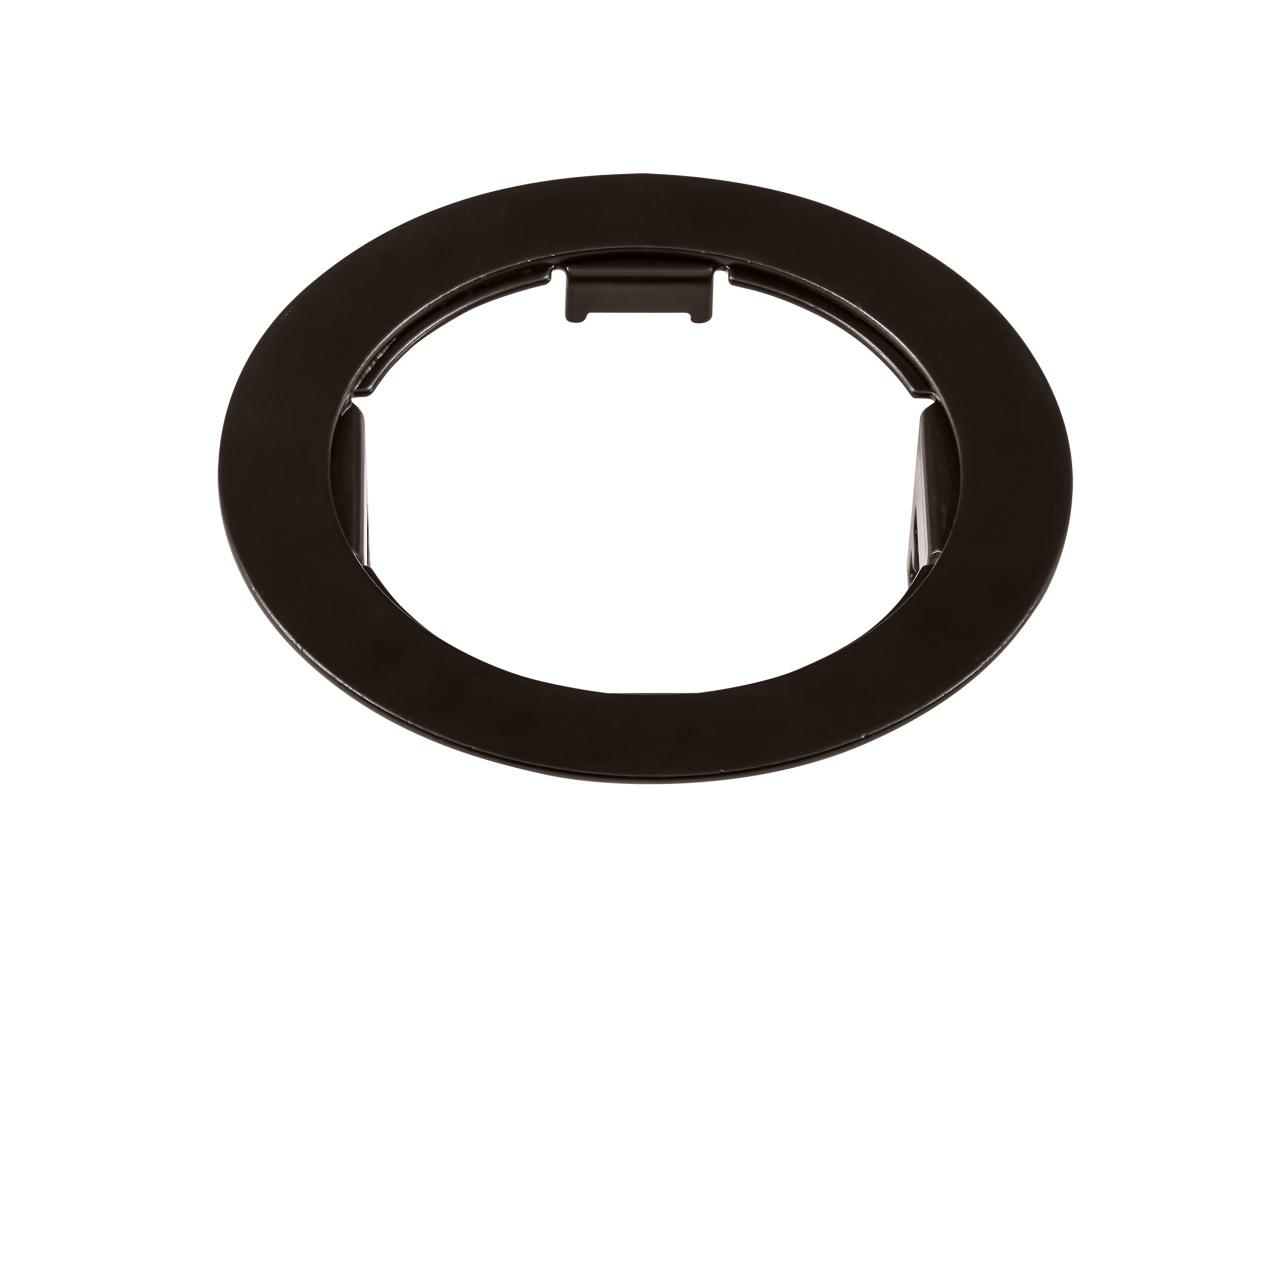 Рамка Domino round МR16 черный Lightstar 214617